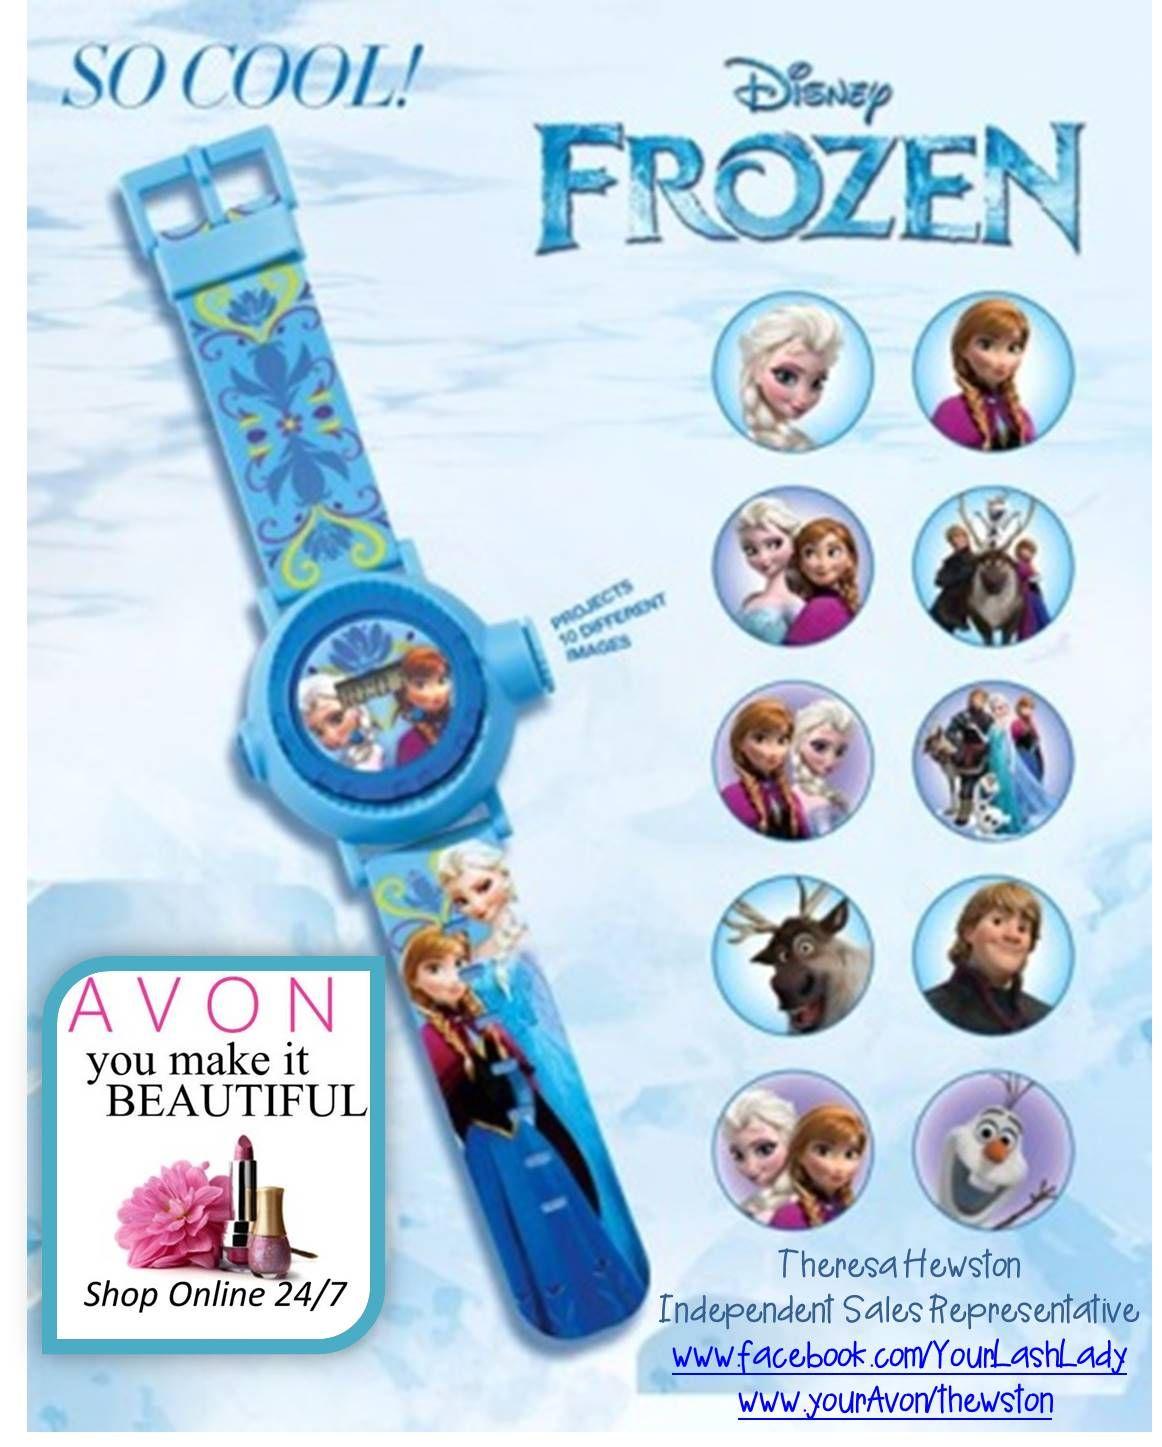 Avon, Disney's Frozen, Elsa, projection watch, Olaf, Sven, gift ideas, children's gifts, Santa shops at Avon, Shop Online 24/7 at www.yourAvon.com/rbeck